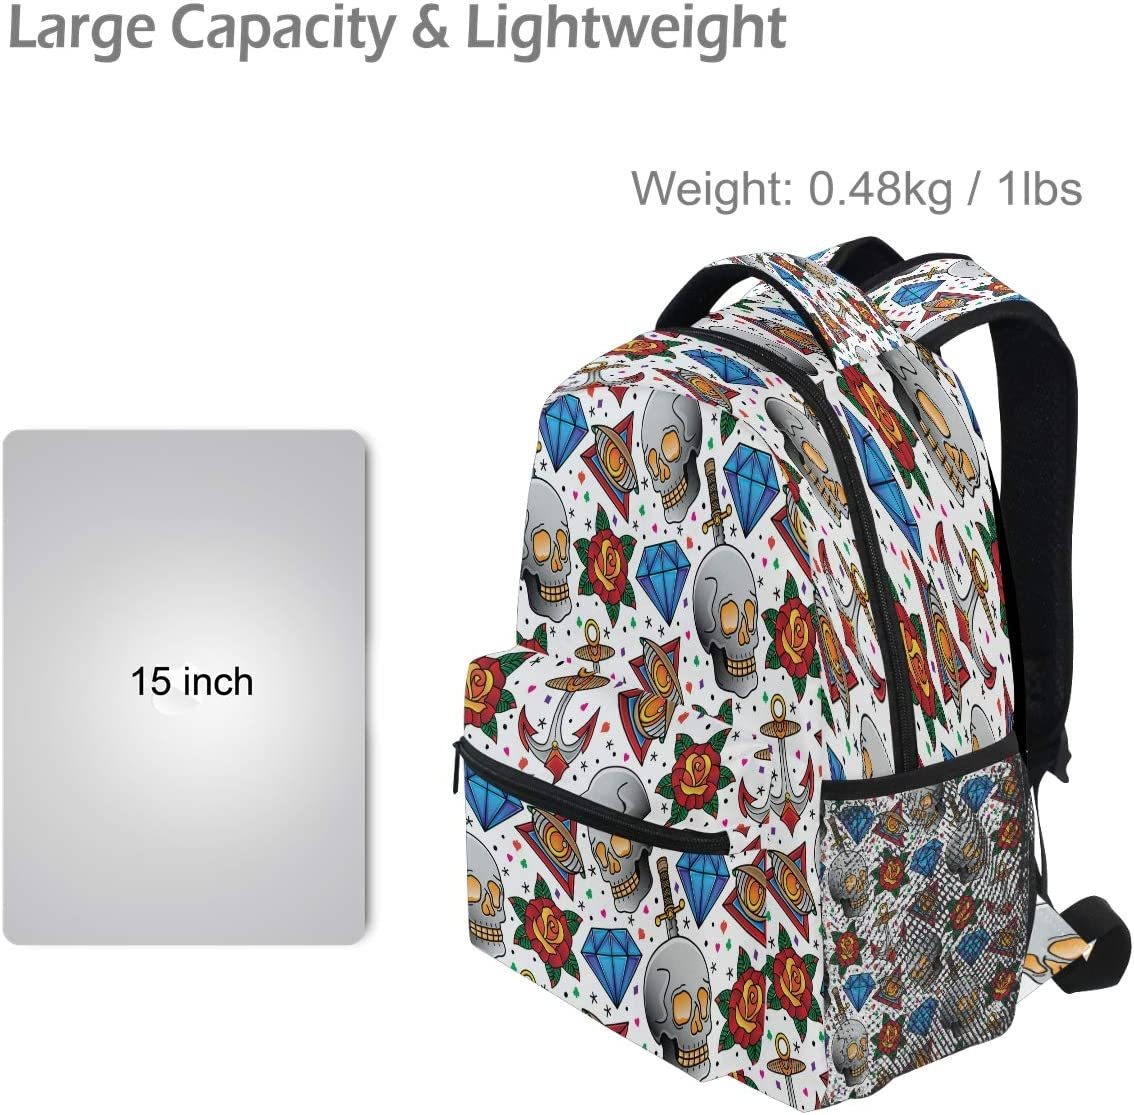 Laptop Backpack Boys Grils Rose Skeleton Drill School Bookbags Computer Daypack for Travel Hiking Camping